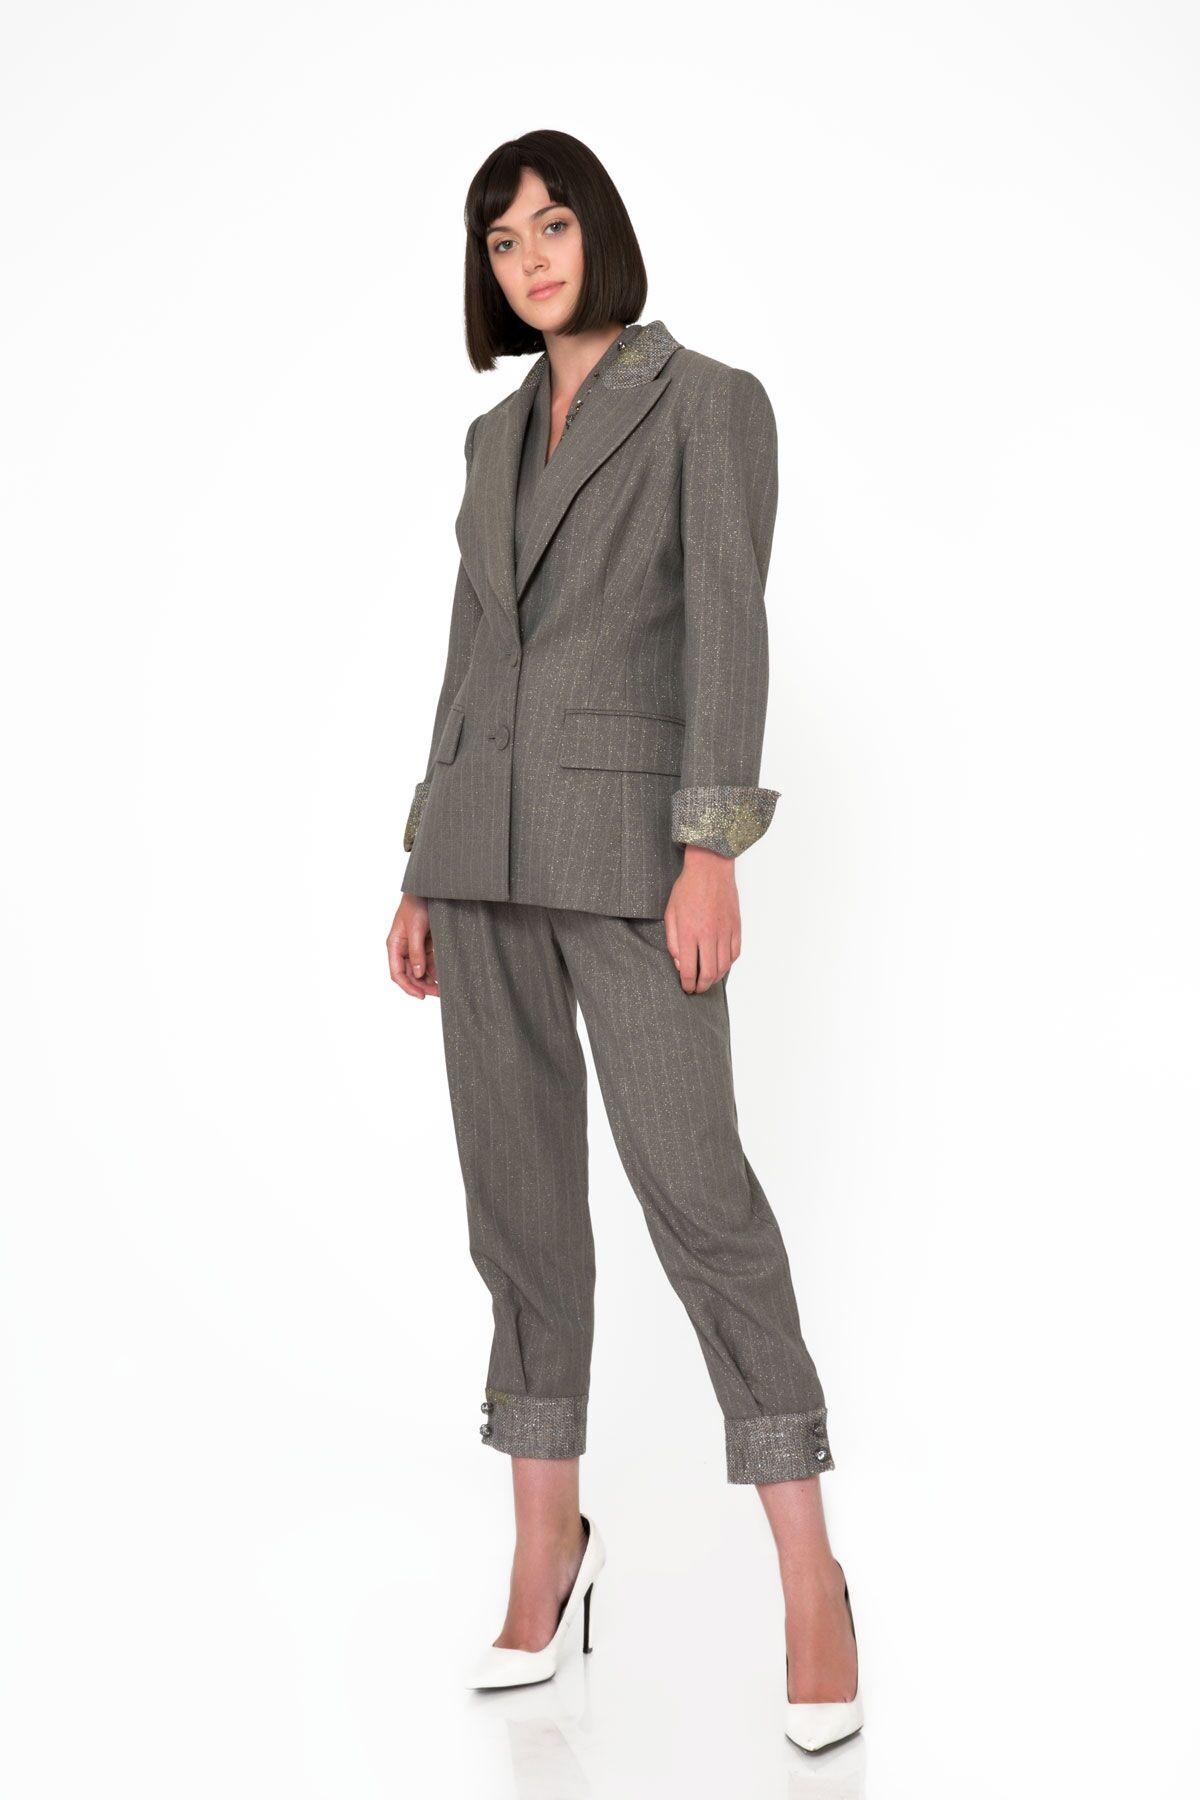 Metallic Collar and Ankle Detail Gray Blazer Jacket